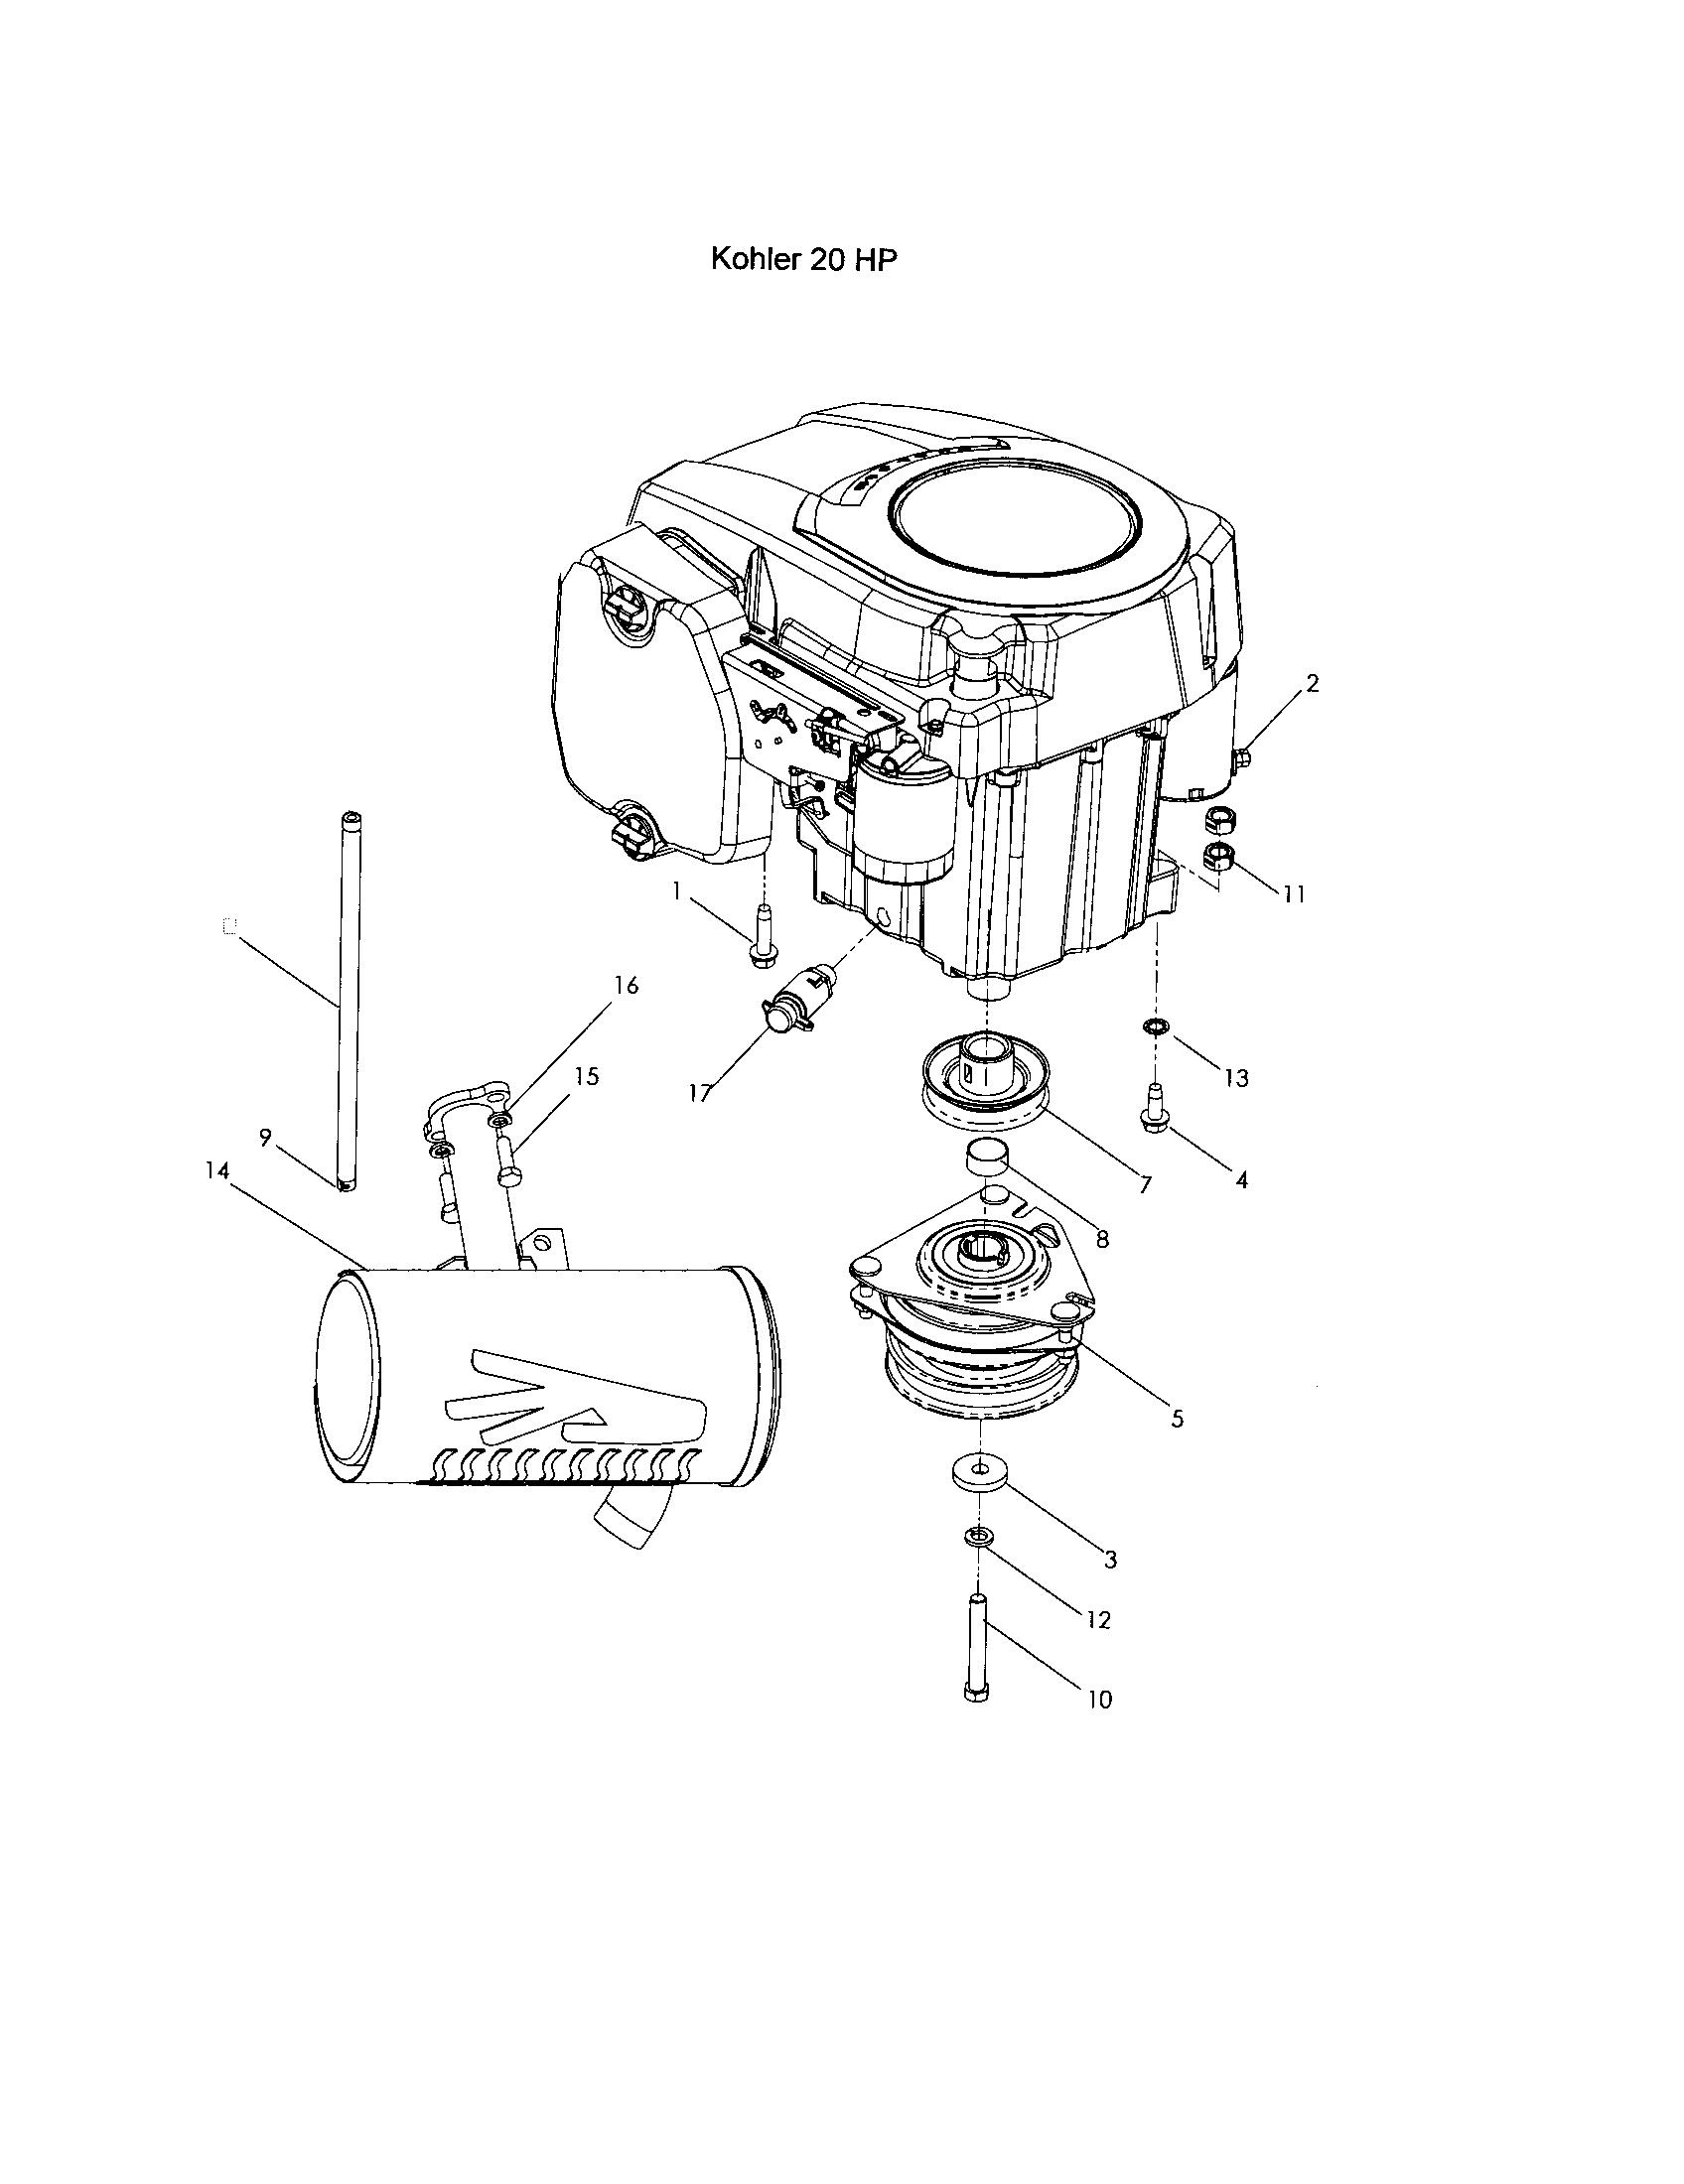 Photos of kohler motor parts